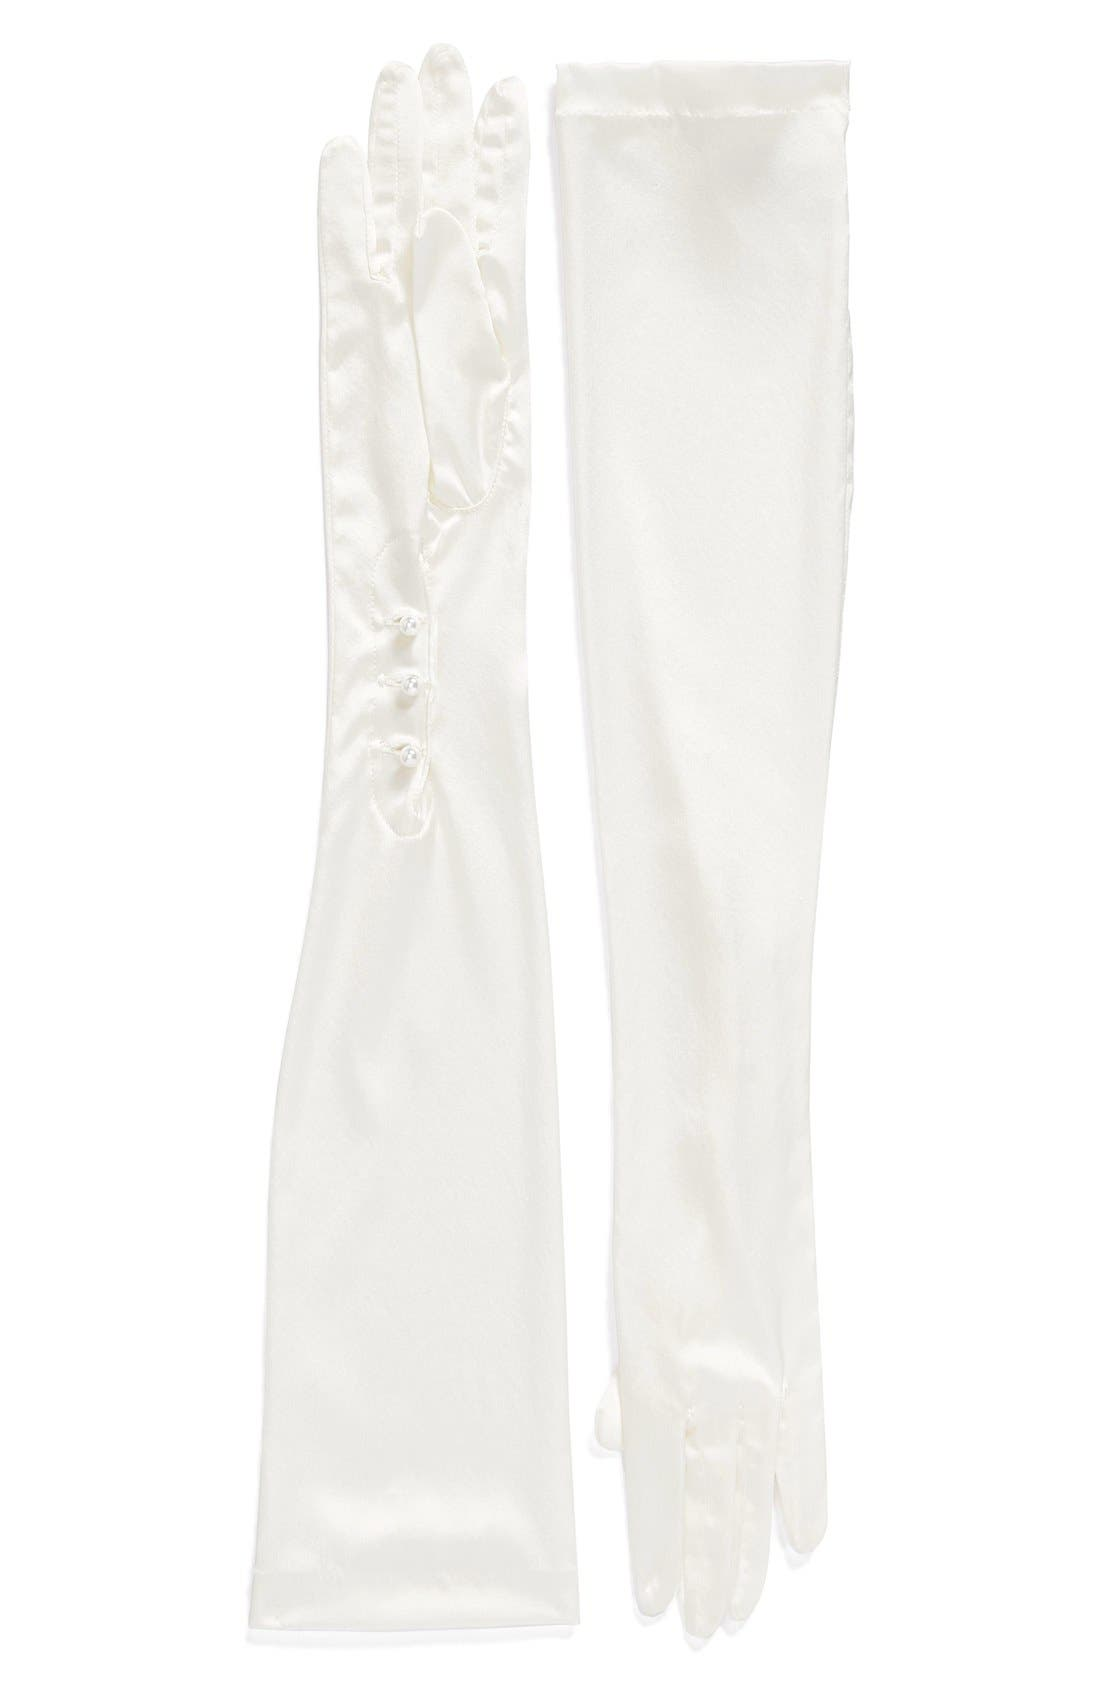 Main Image - CAROLINA AMATO Opera Length Mousquetaire Stretch Silk Gloves